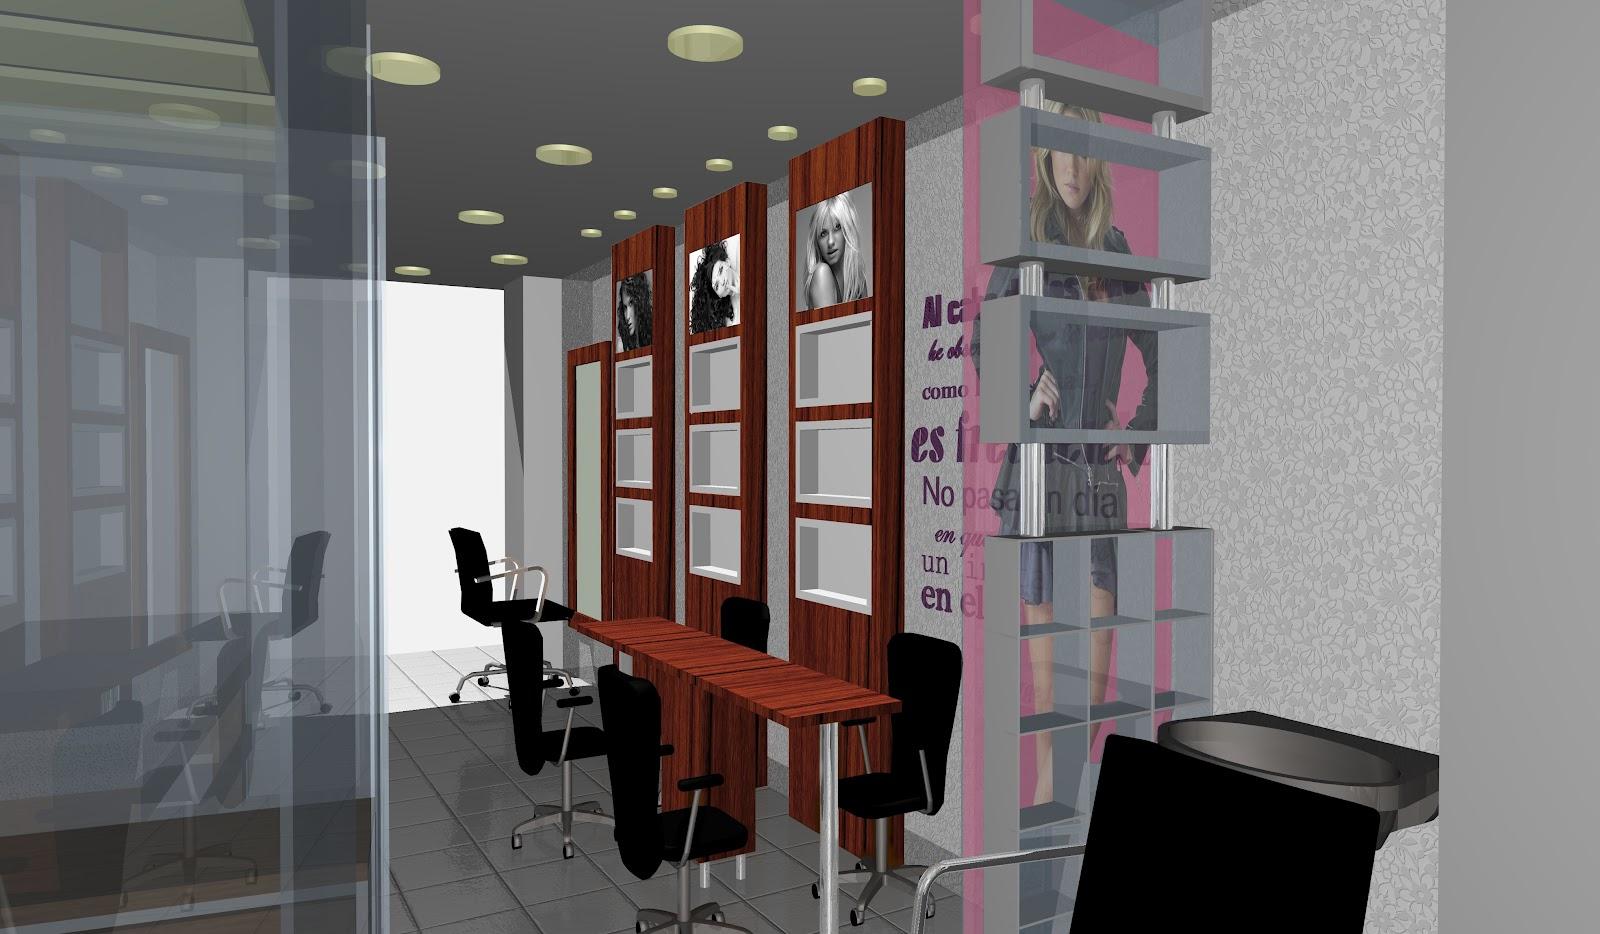 Muebles para salon de belleza Muebles Hogar Jardin en  - imagenes de muebles para salon de belleza